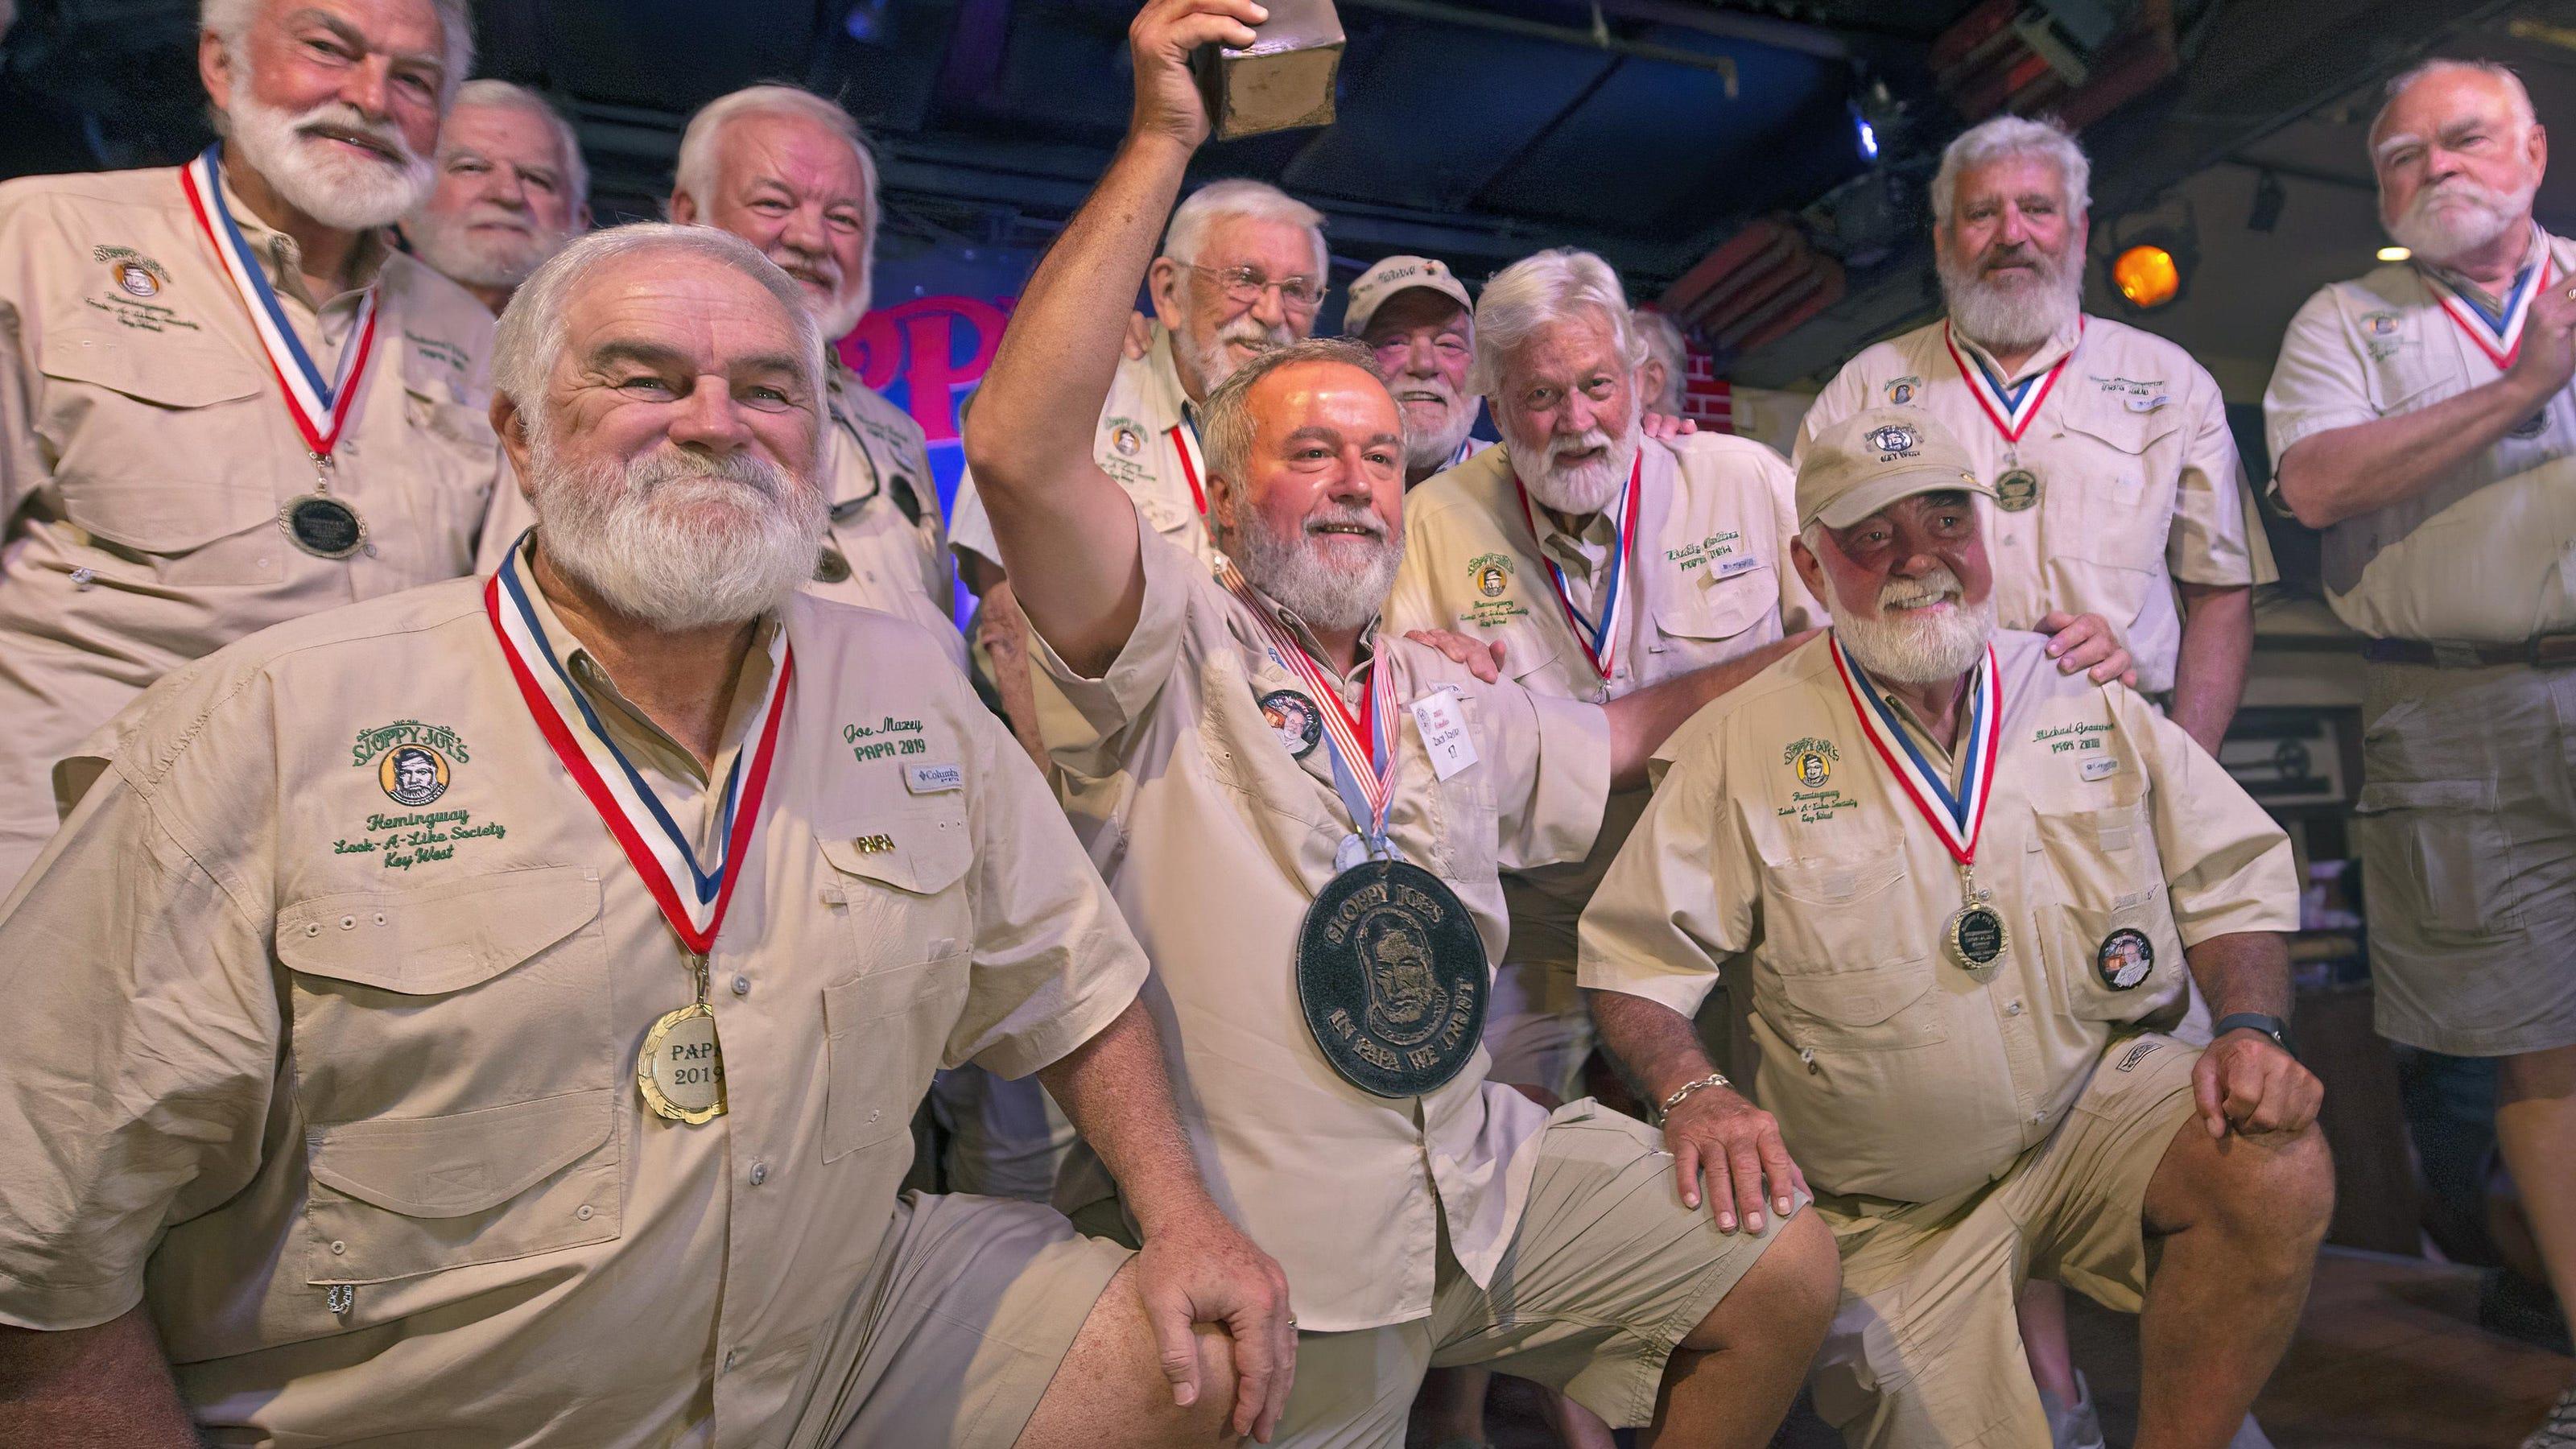 Hemingway look-alike, shrinking Great Salt Lake, Polish war hero : News from around our 50 states